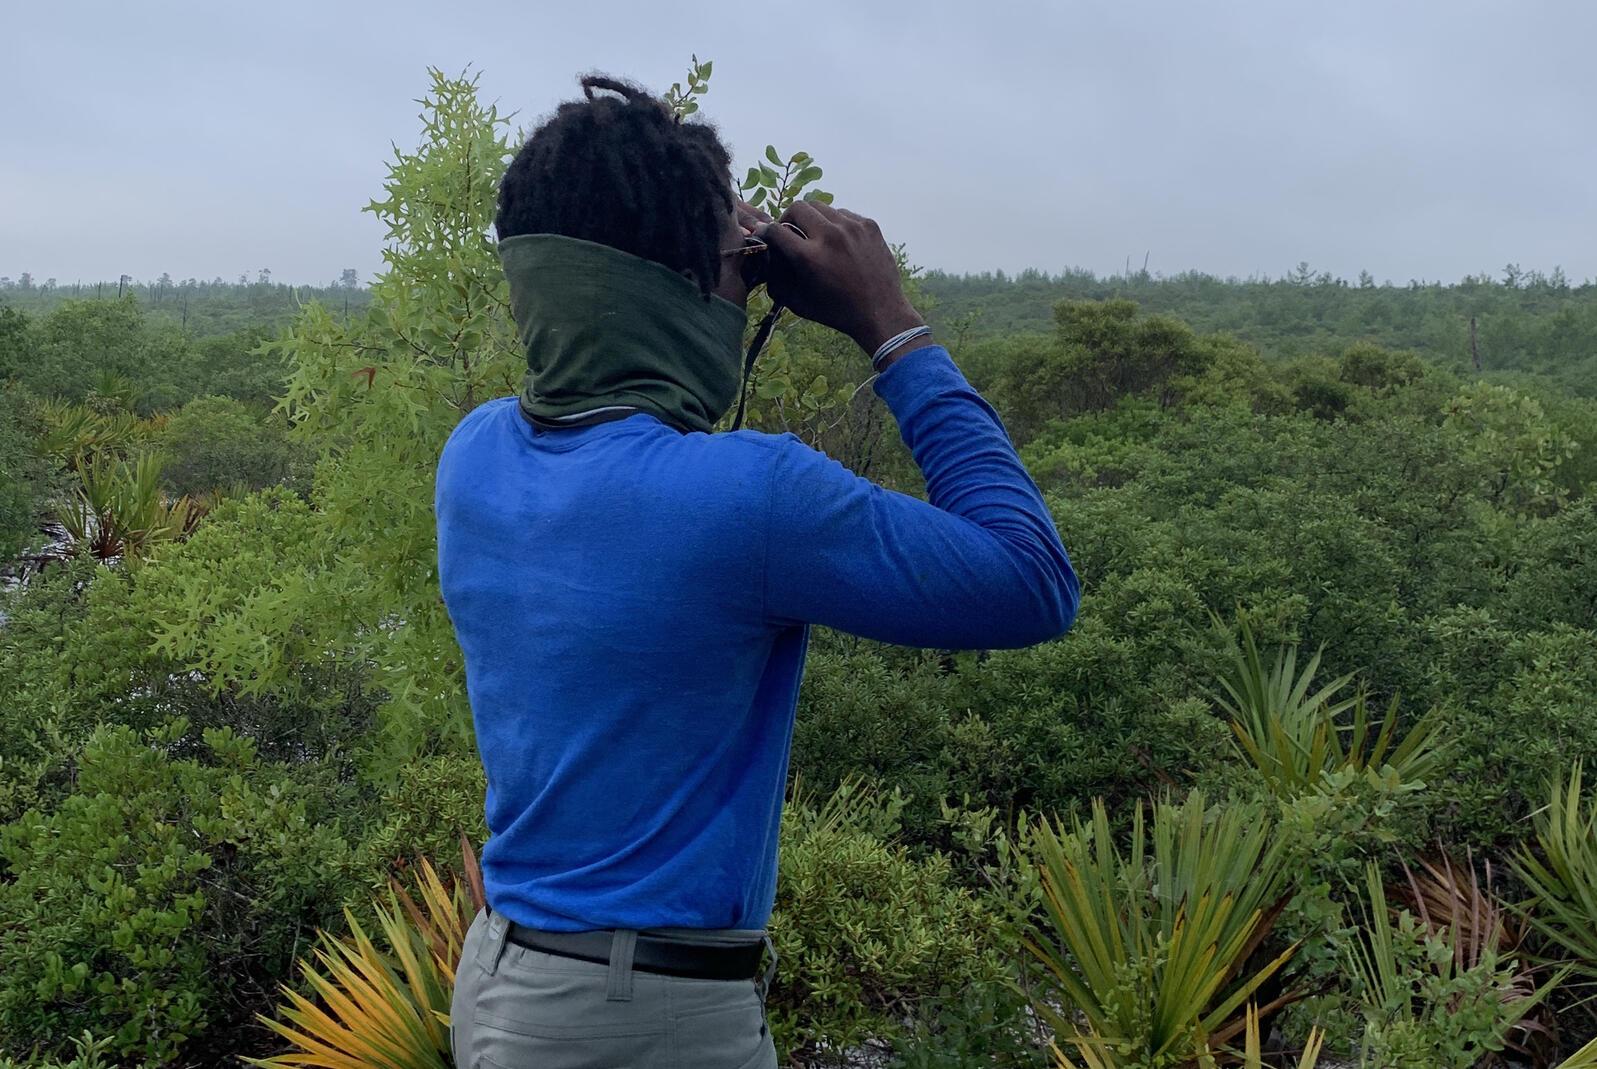 Herby Zephir birding in Ocala National Forest.